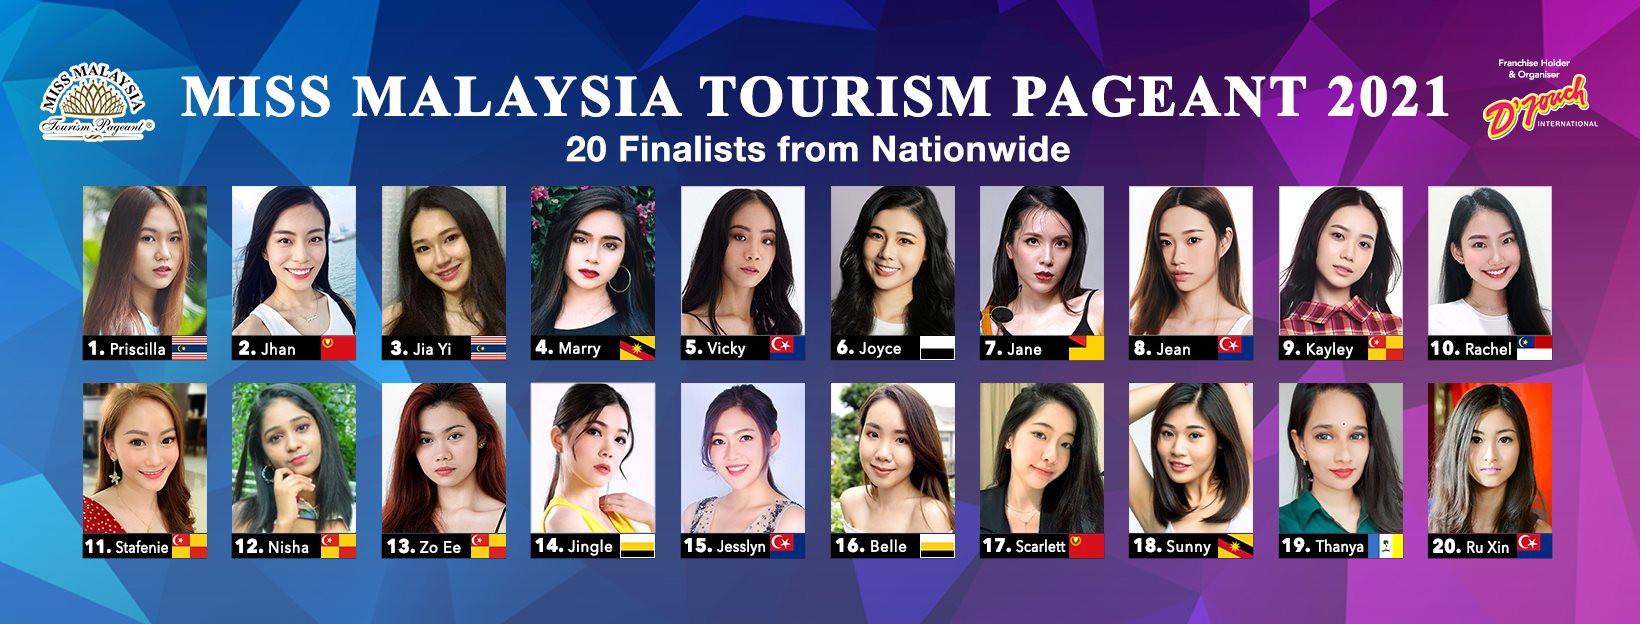 candidatas a miss tourism malaysia 2021. final: 30 abril. - Página 2 B2UUb9